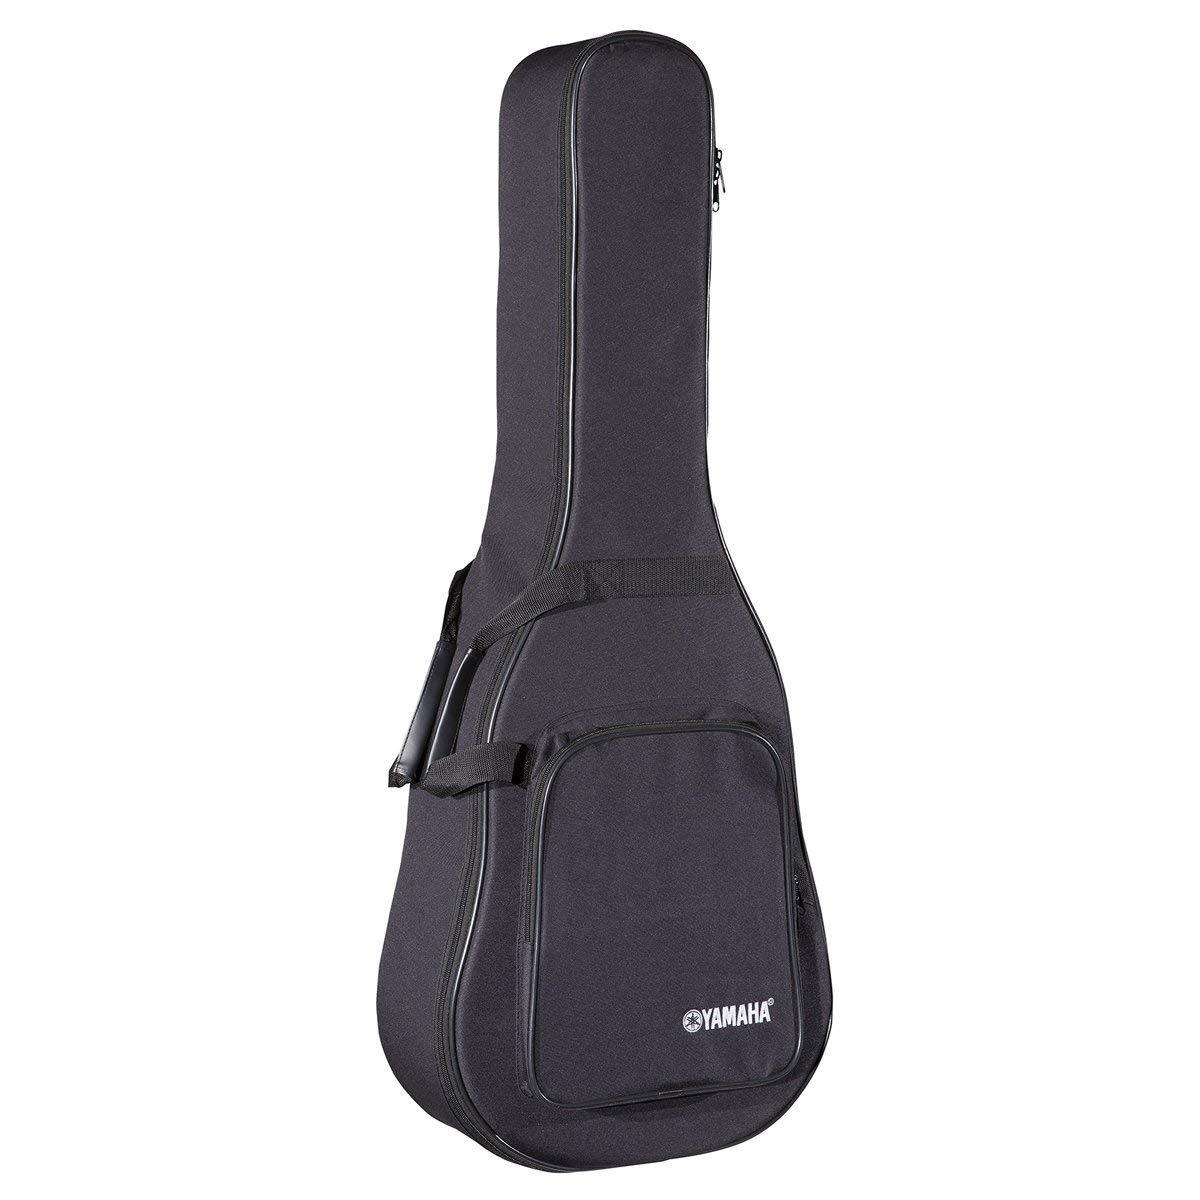 Yamaha SC EG Lightweight Gig Bag for Electric Guitar